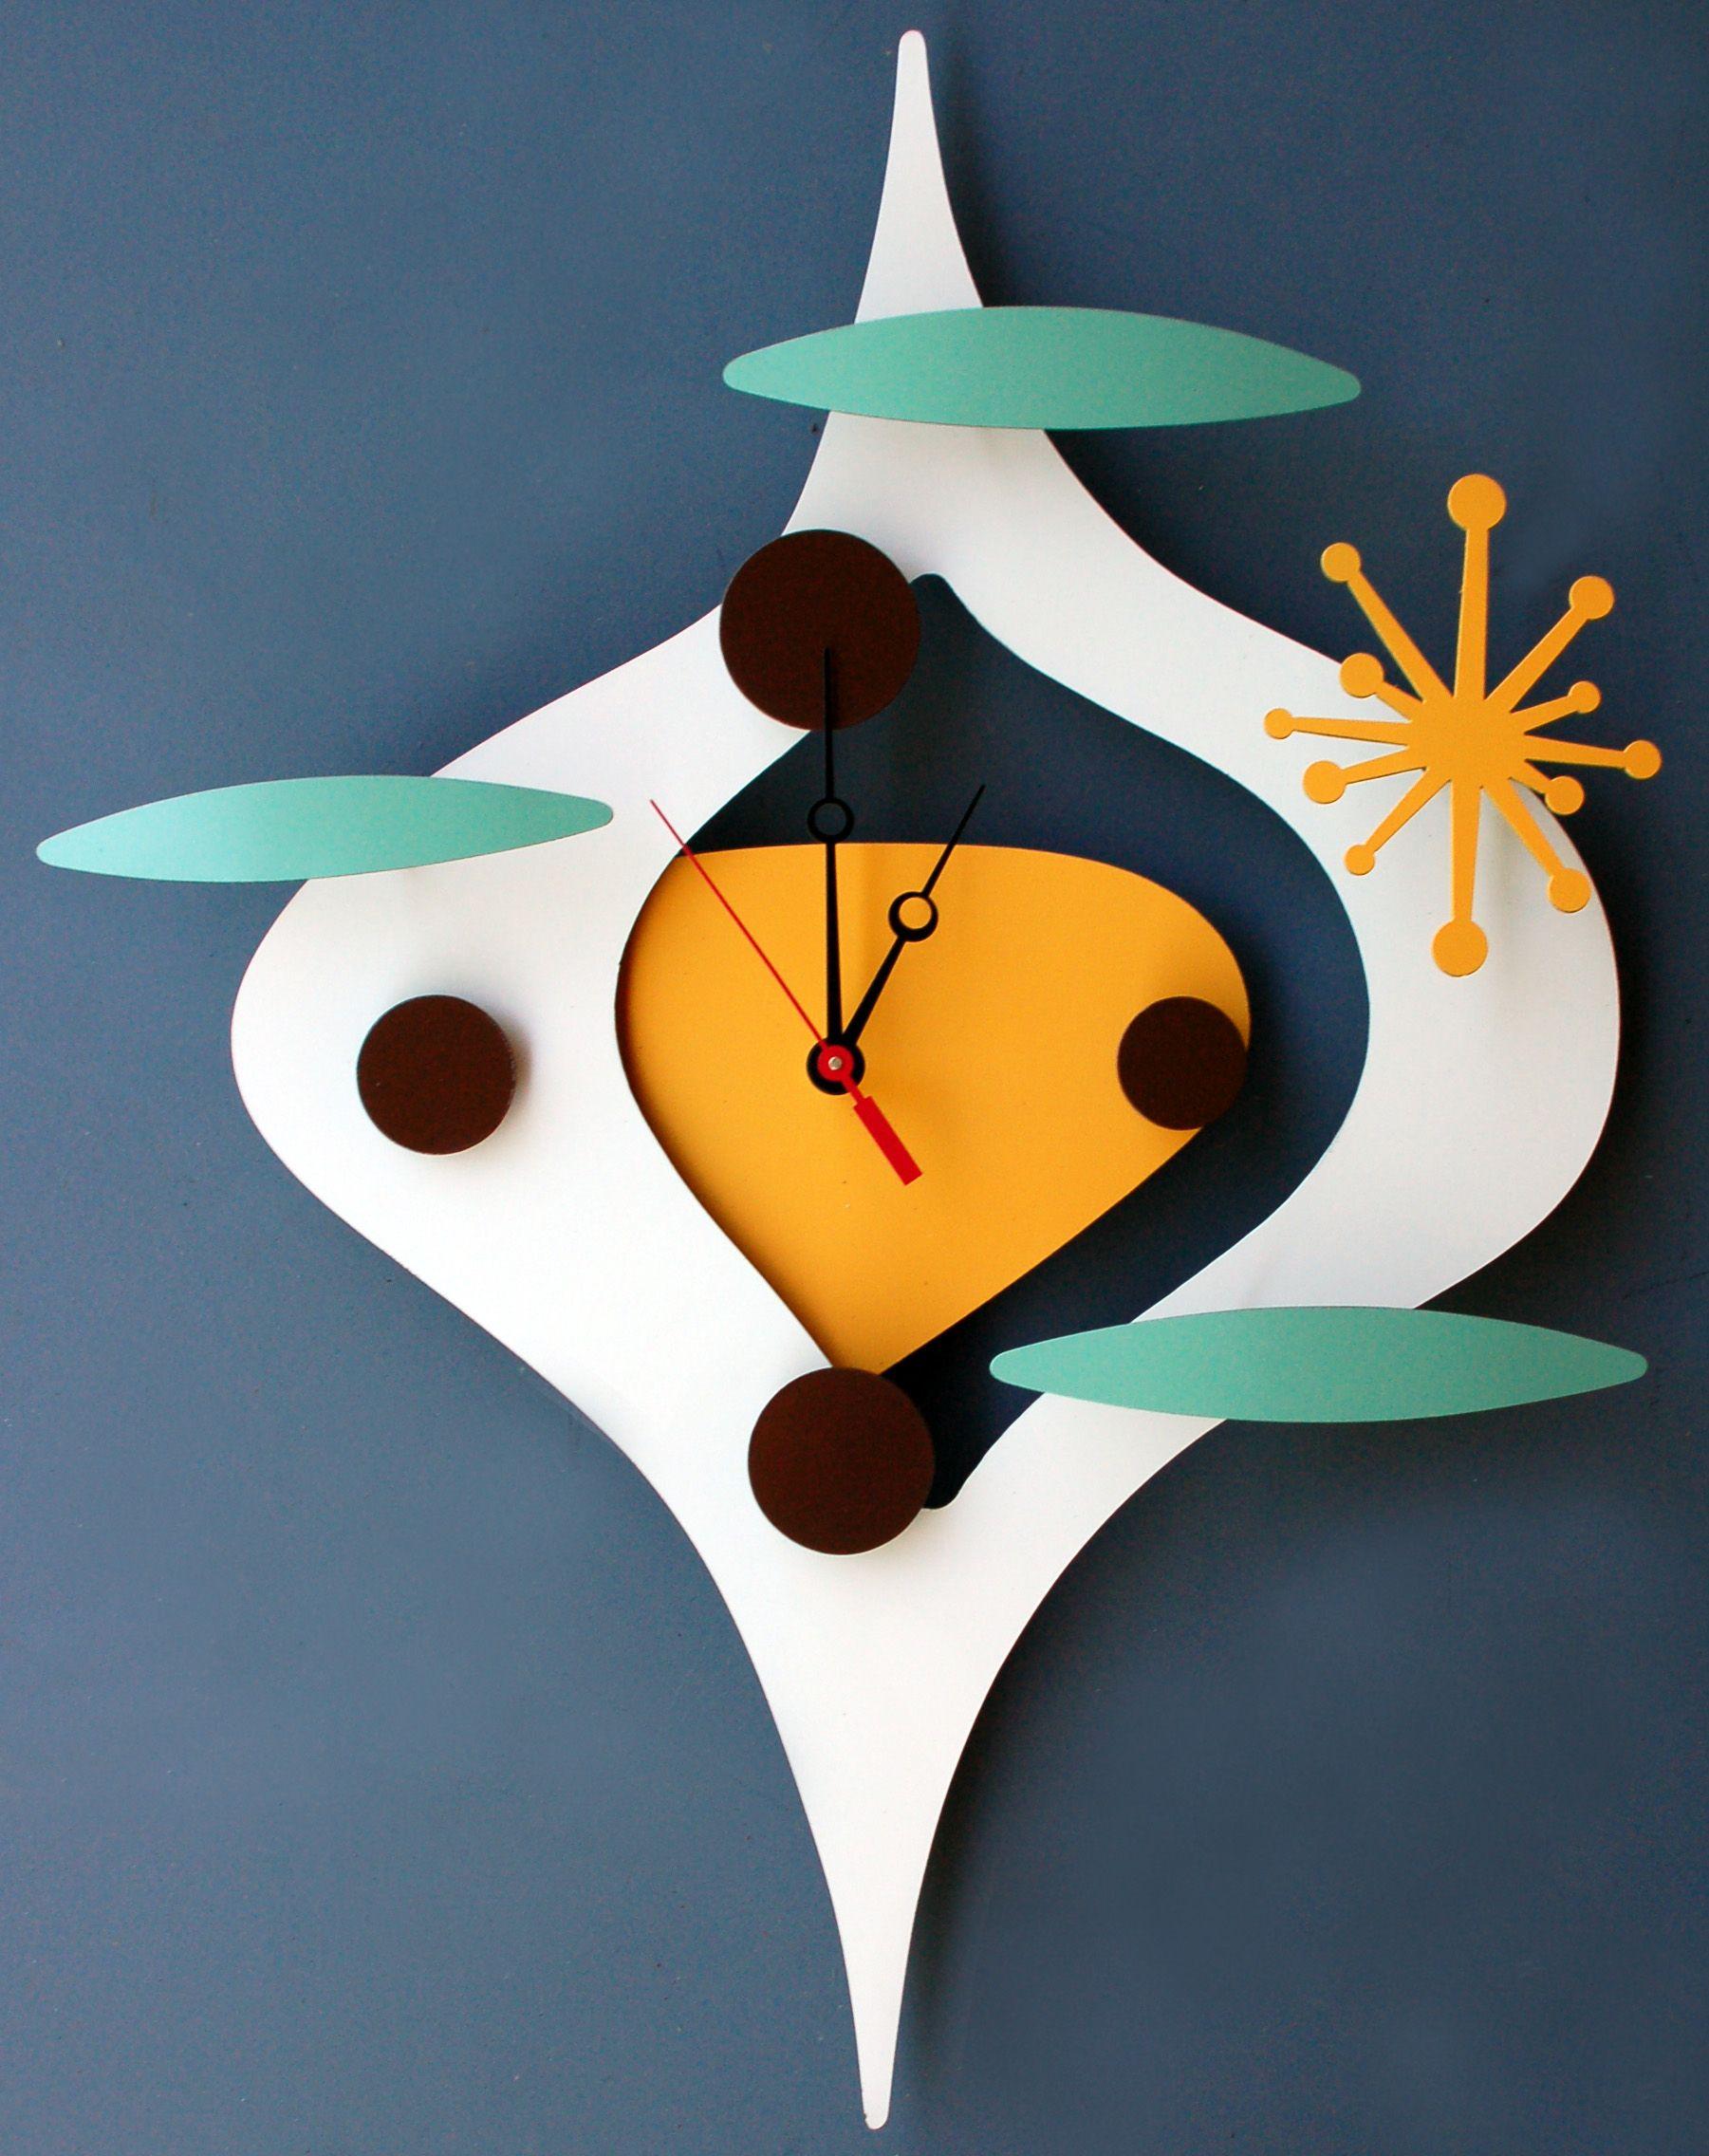 retro space age clock love this shape design m bel einrichtungen pinterest kreativer. Black Bedroom Furniture Sets. Home Design Ideas